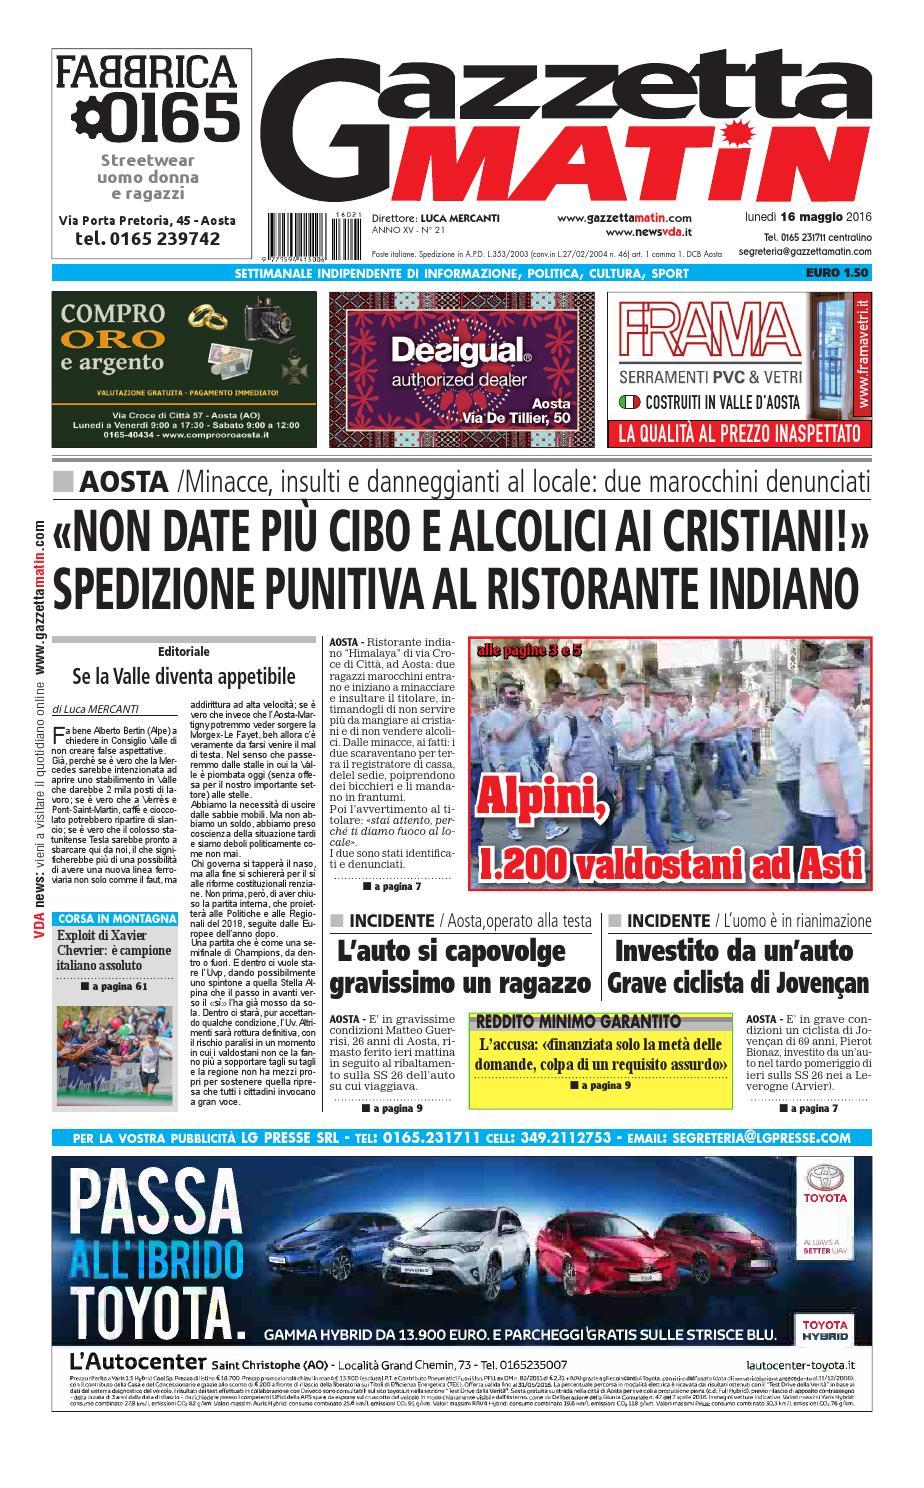 d6c13b40f79a1 Gazzetta Matin del 16 maggio 2016 by NewsVDA - issuu